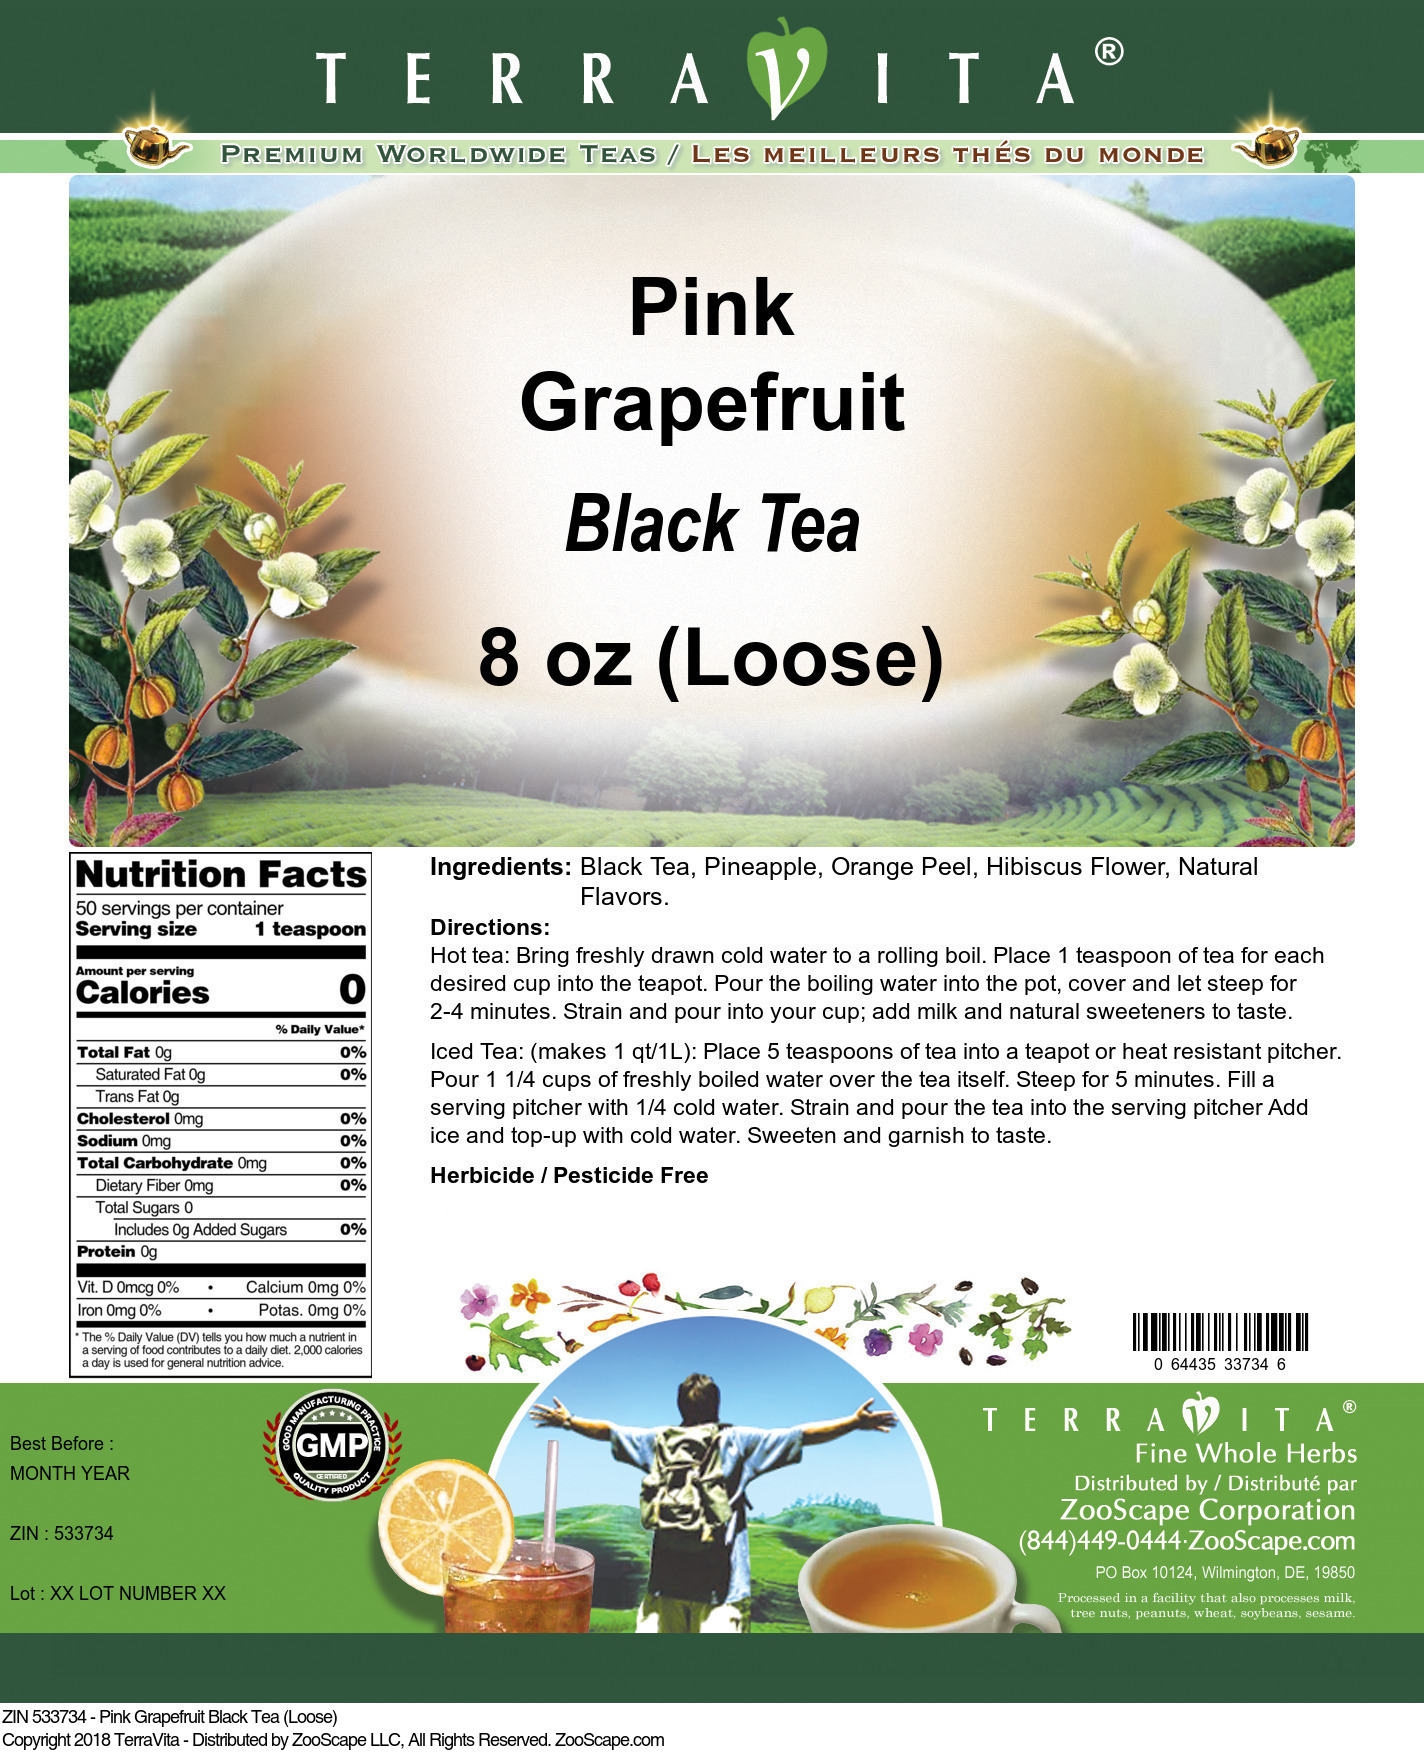 Pink Grapefruit Black Tea (Loose)